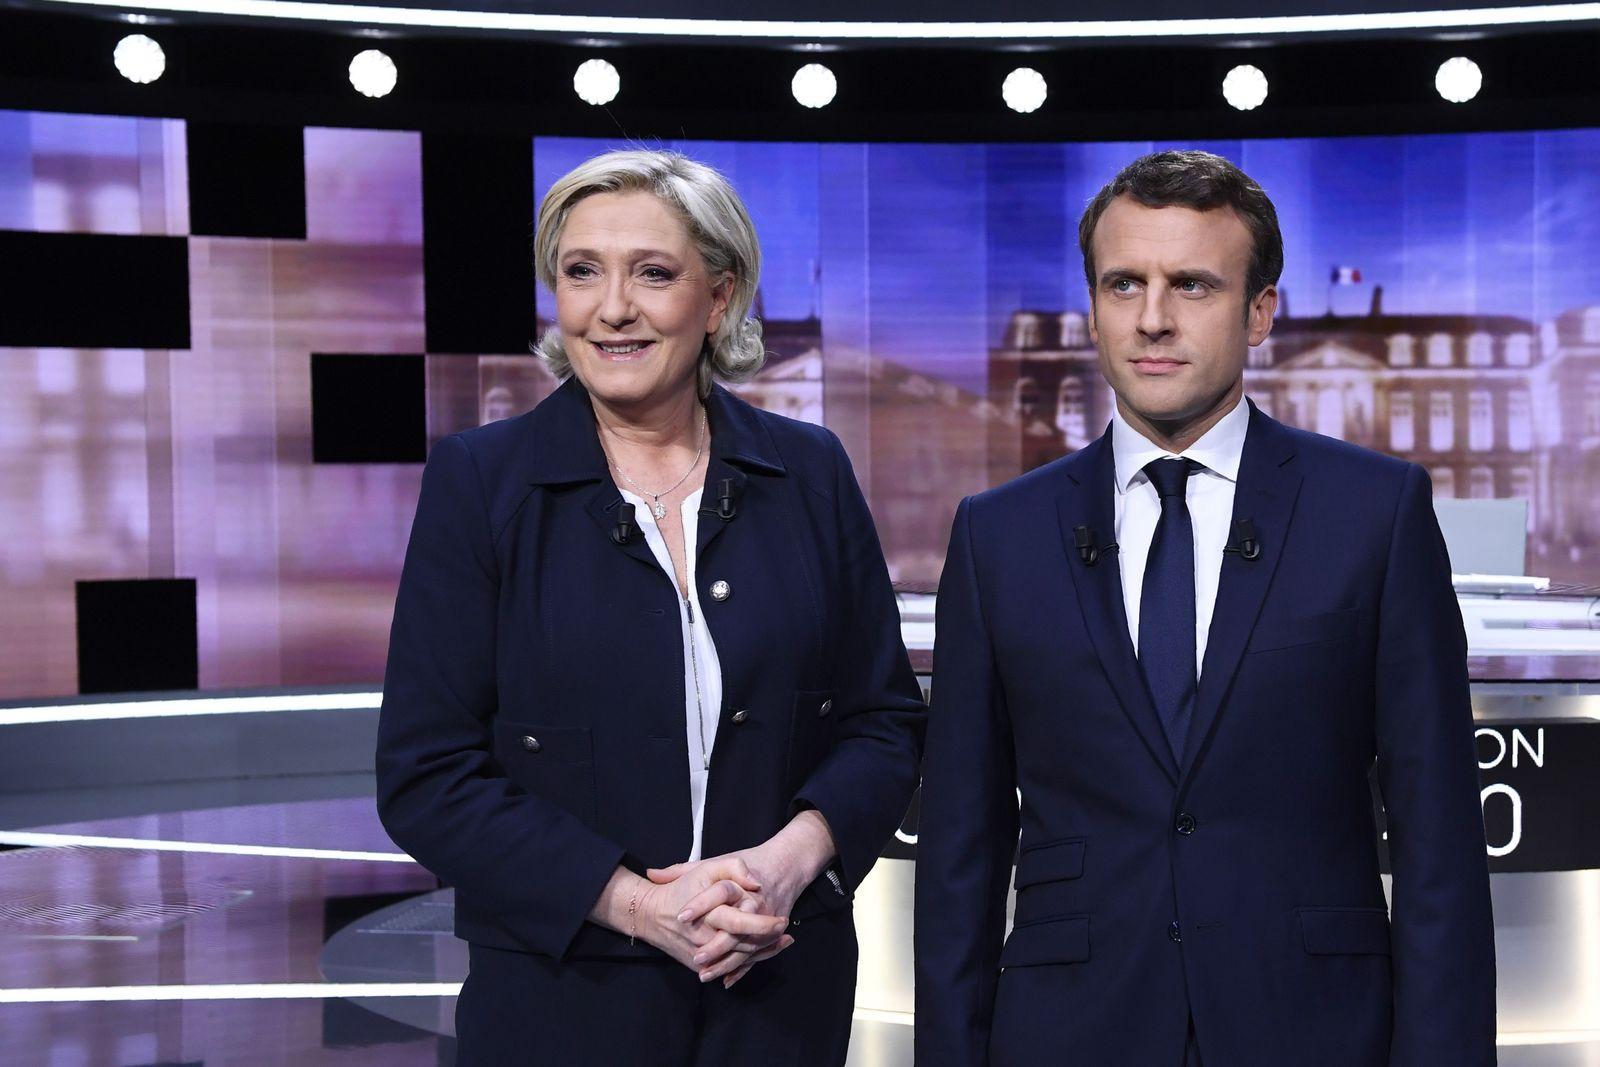 FRANCE-ELECTION/DEBATE